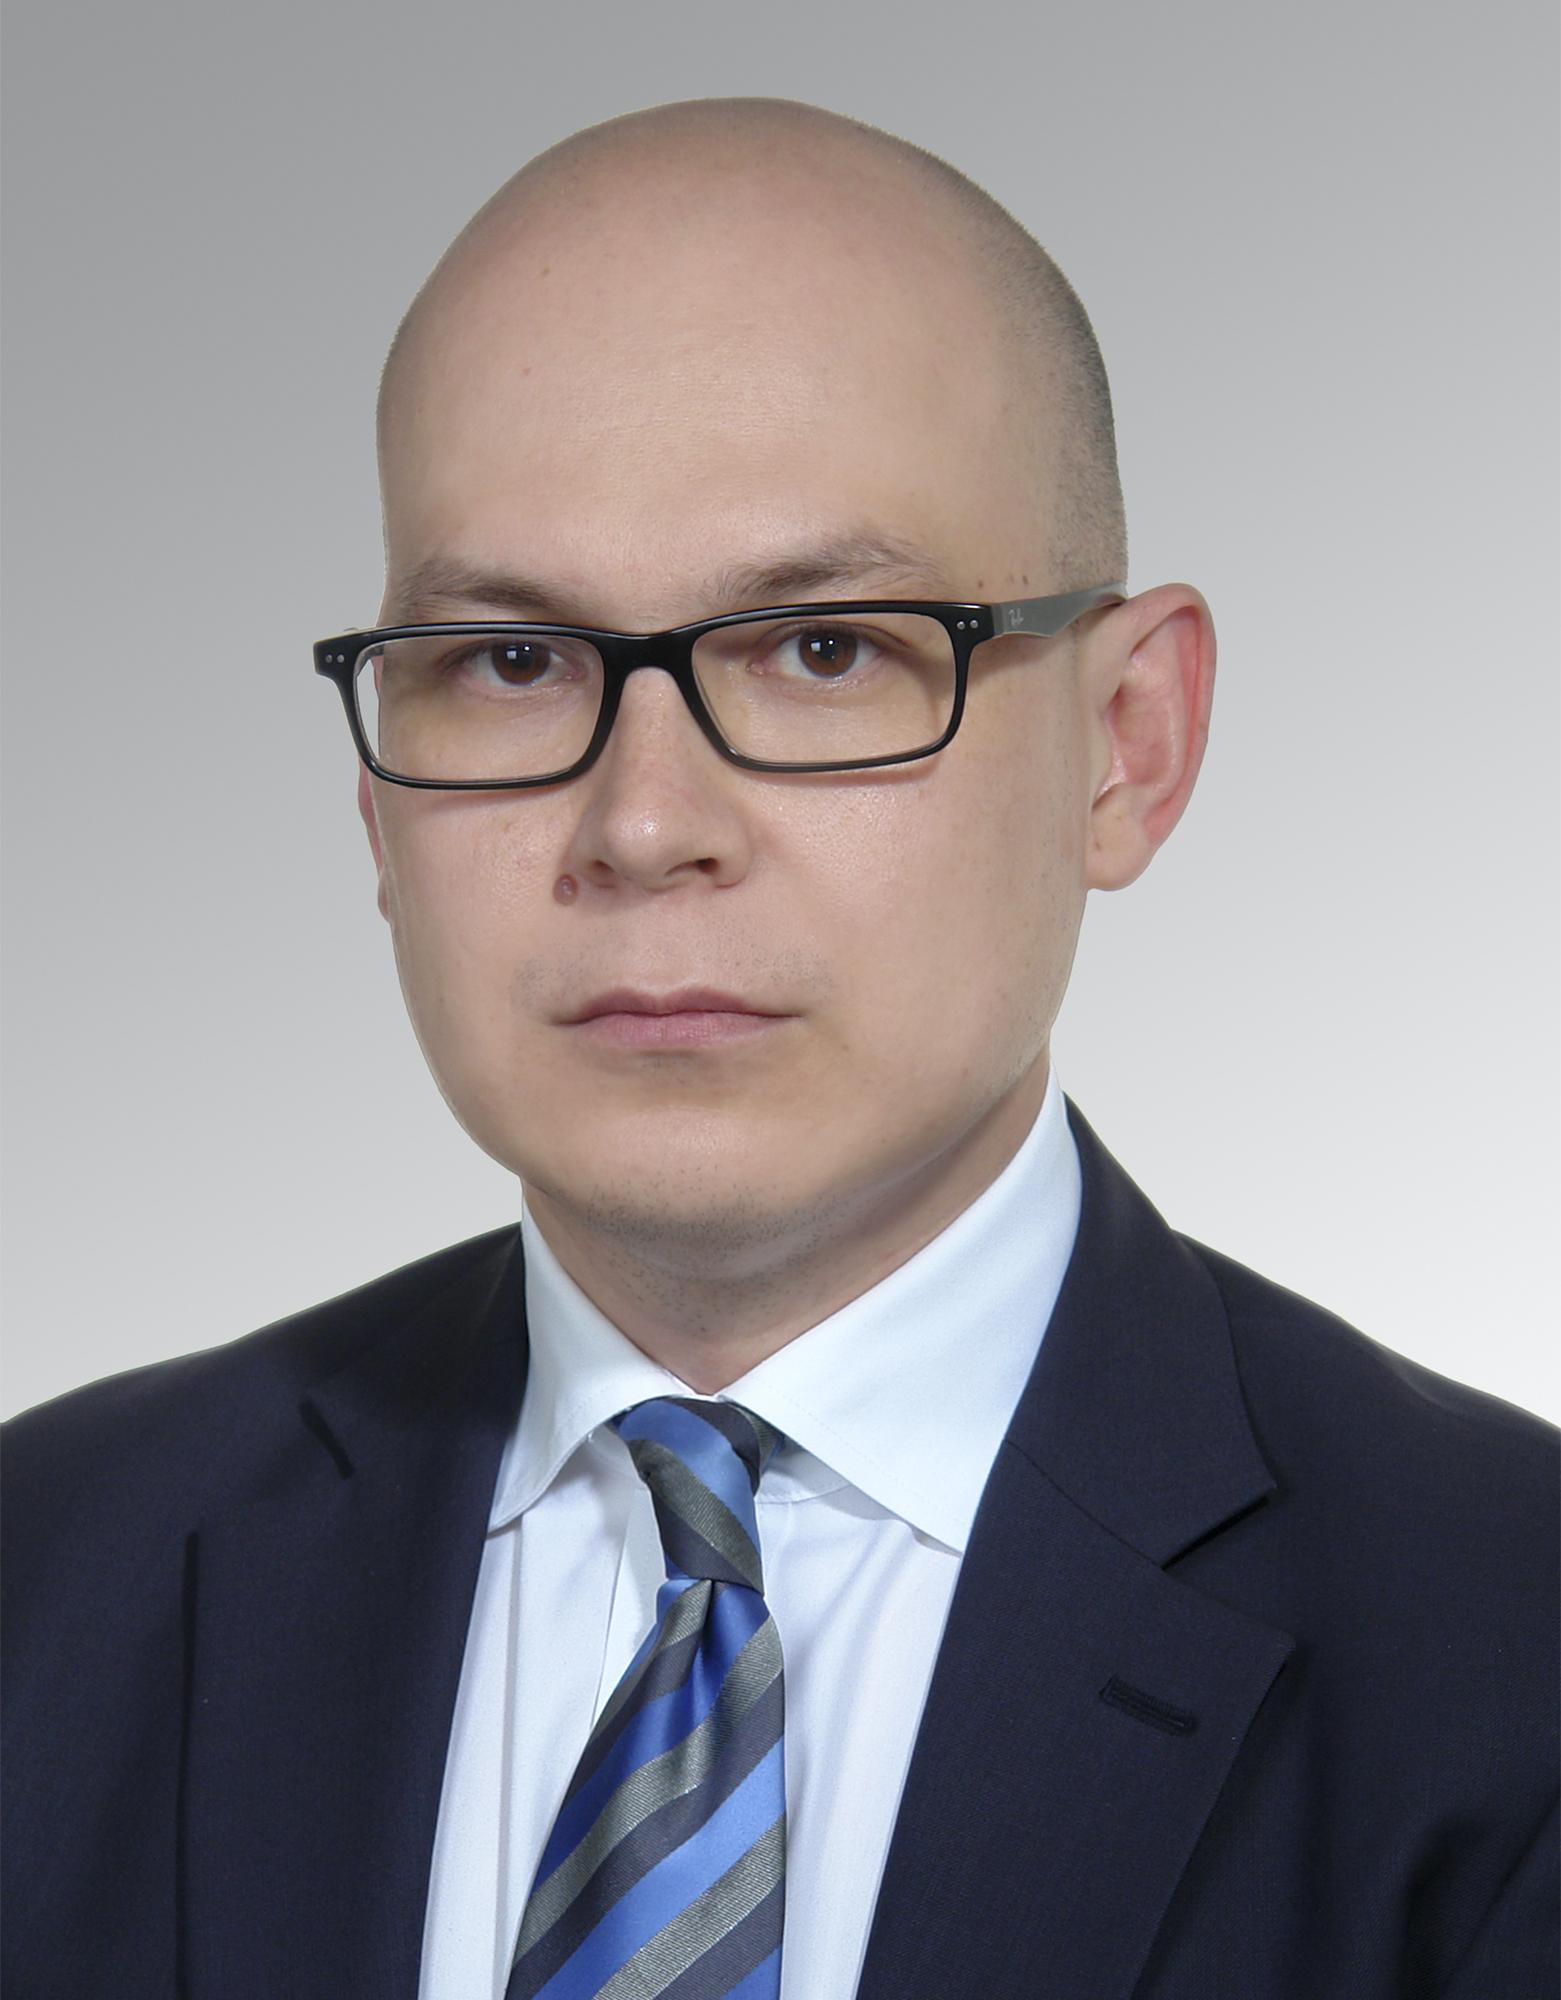 Зиннатуллин Ильнар Асхадуллович